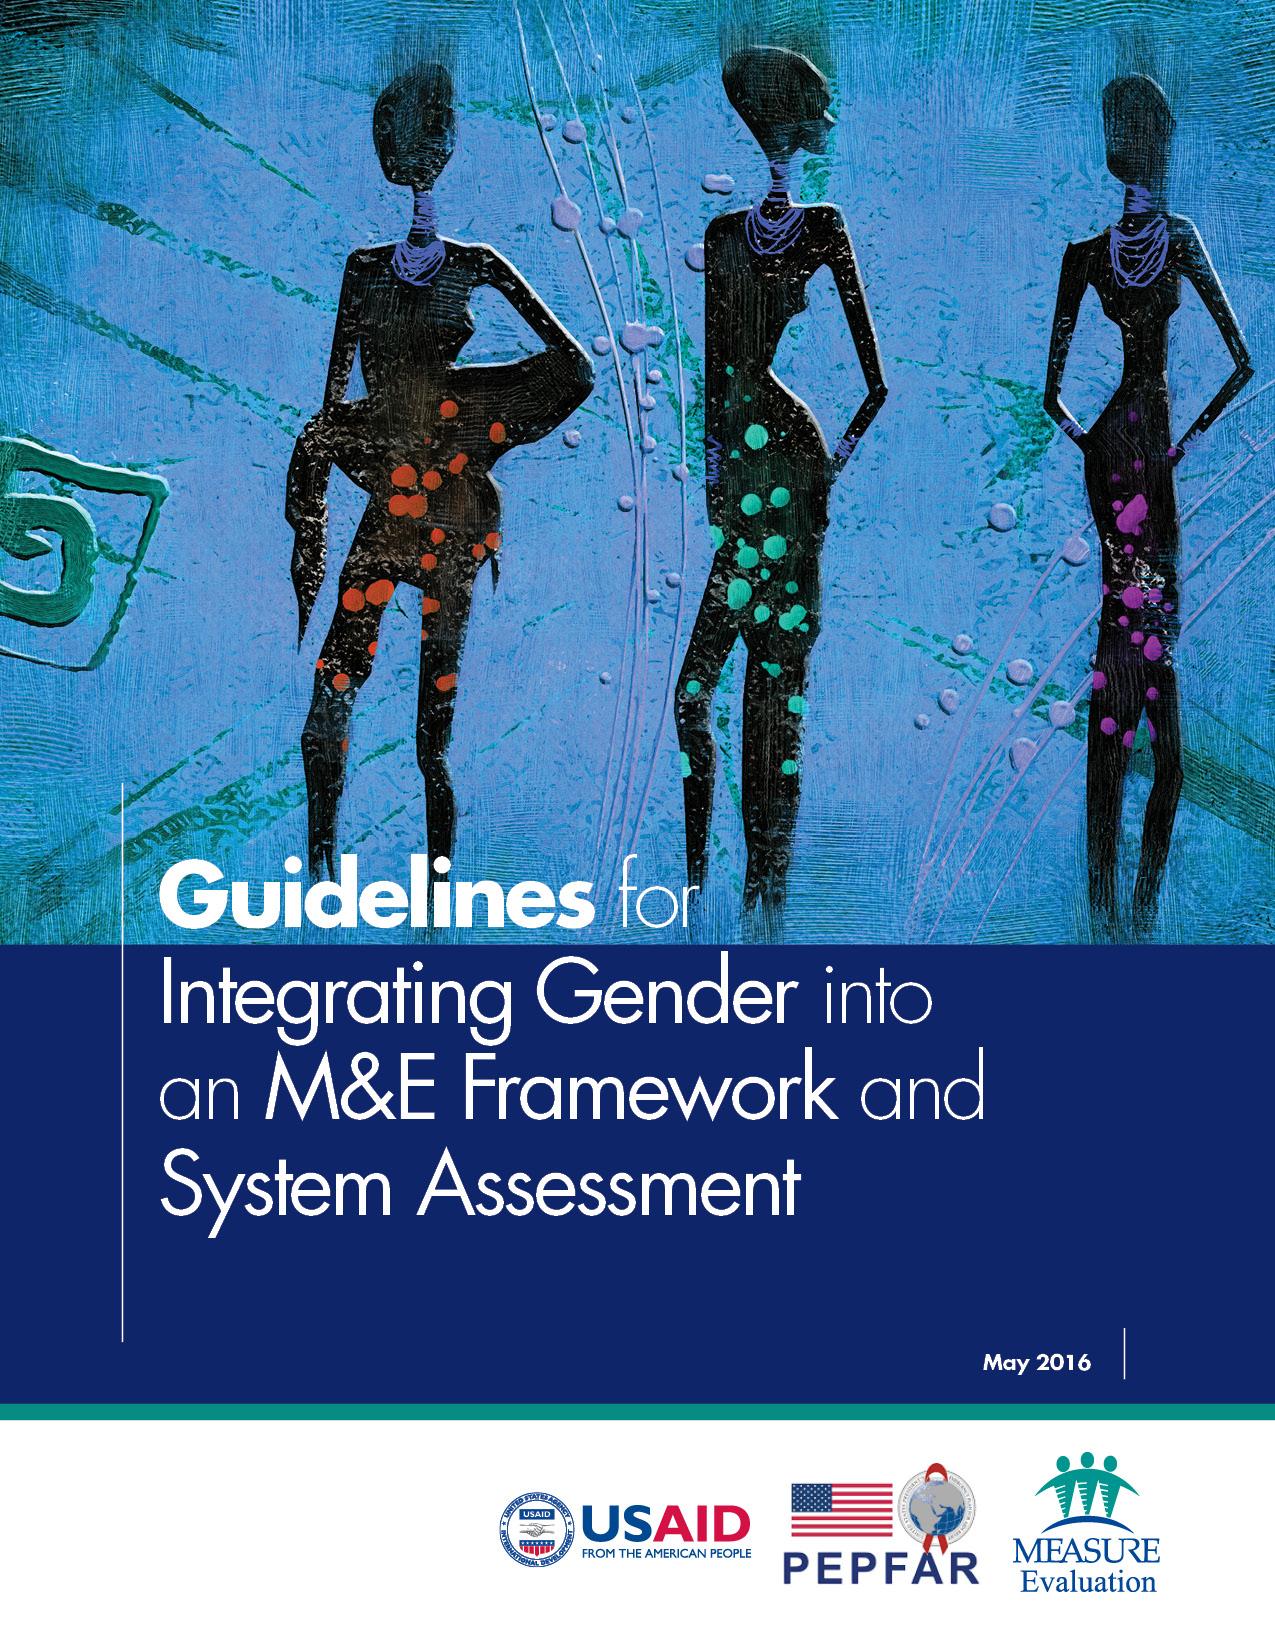 Guidelines for Integrating Gender into an M&E Framework and System Assessment